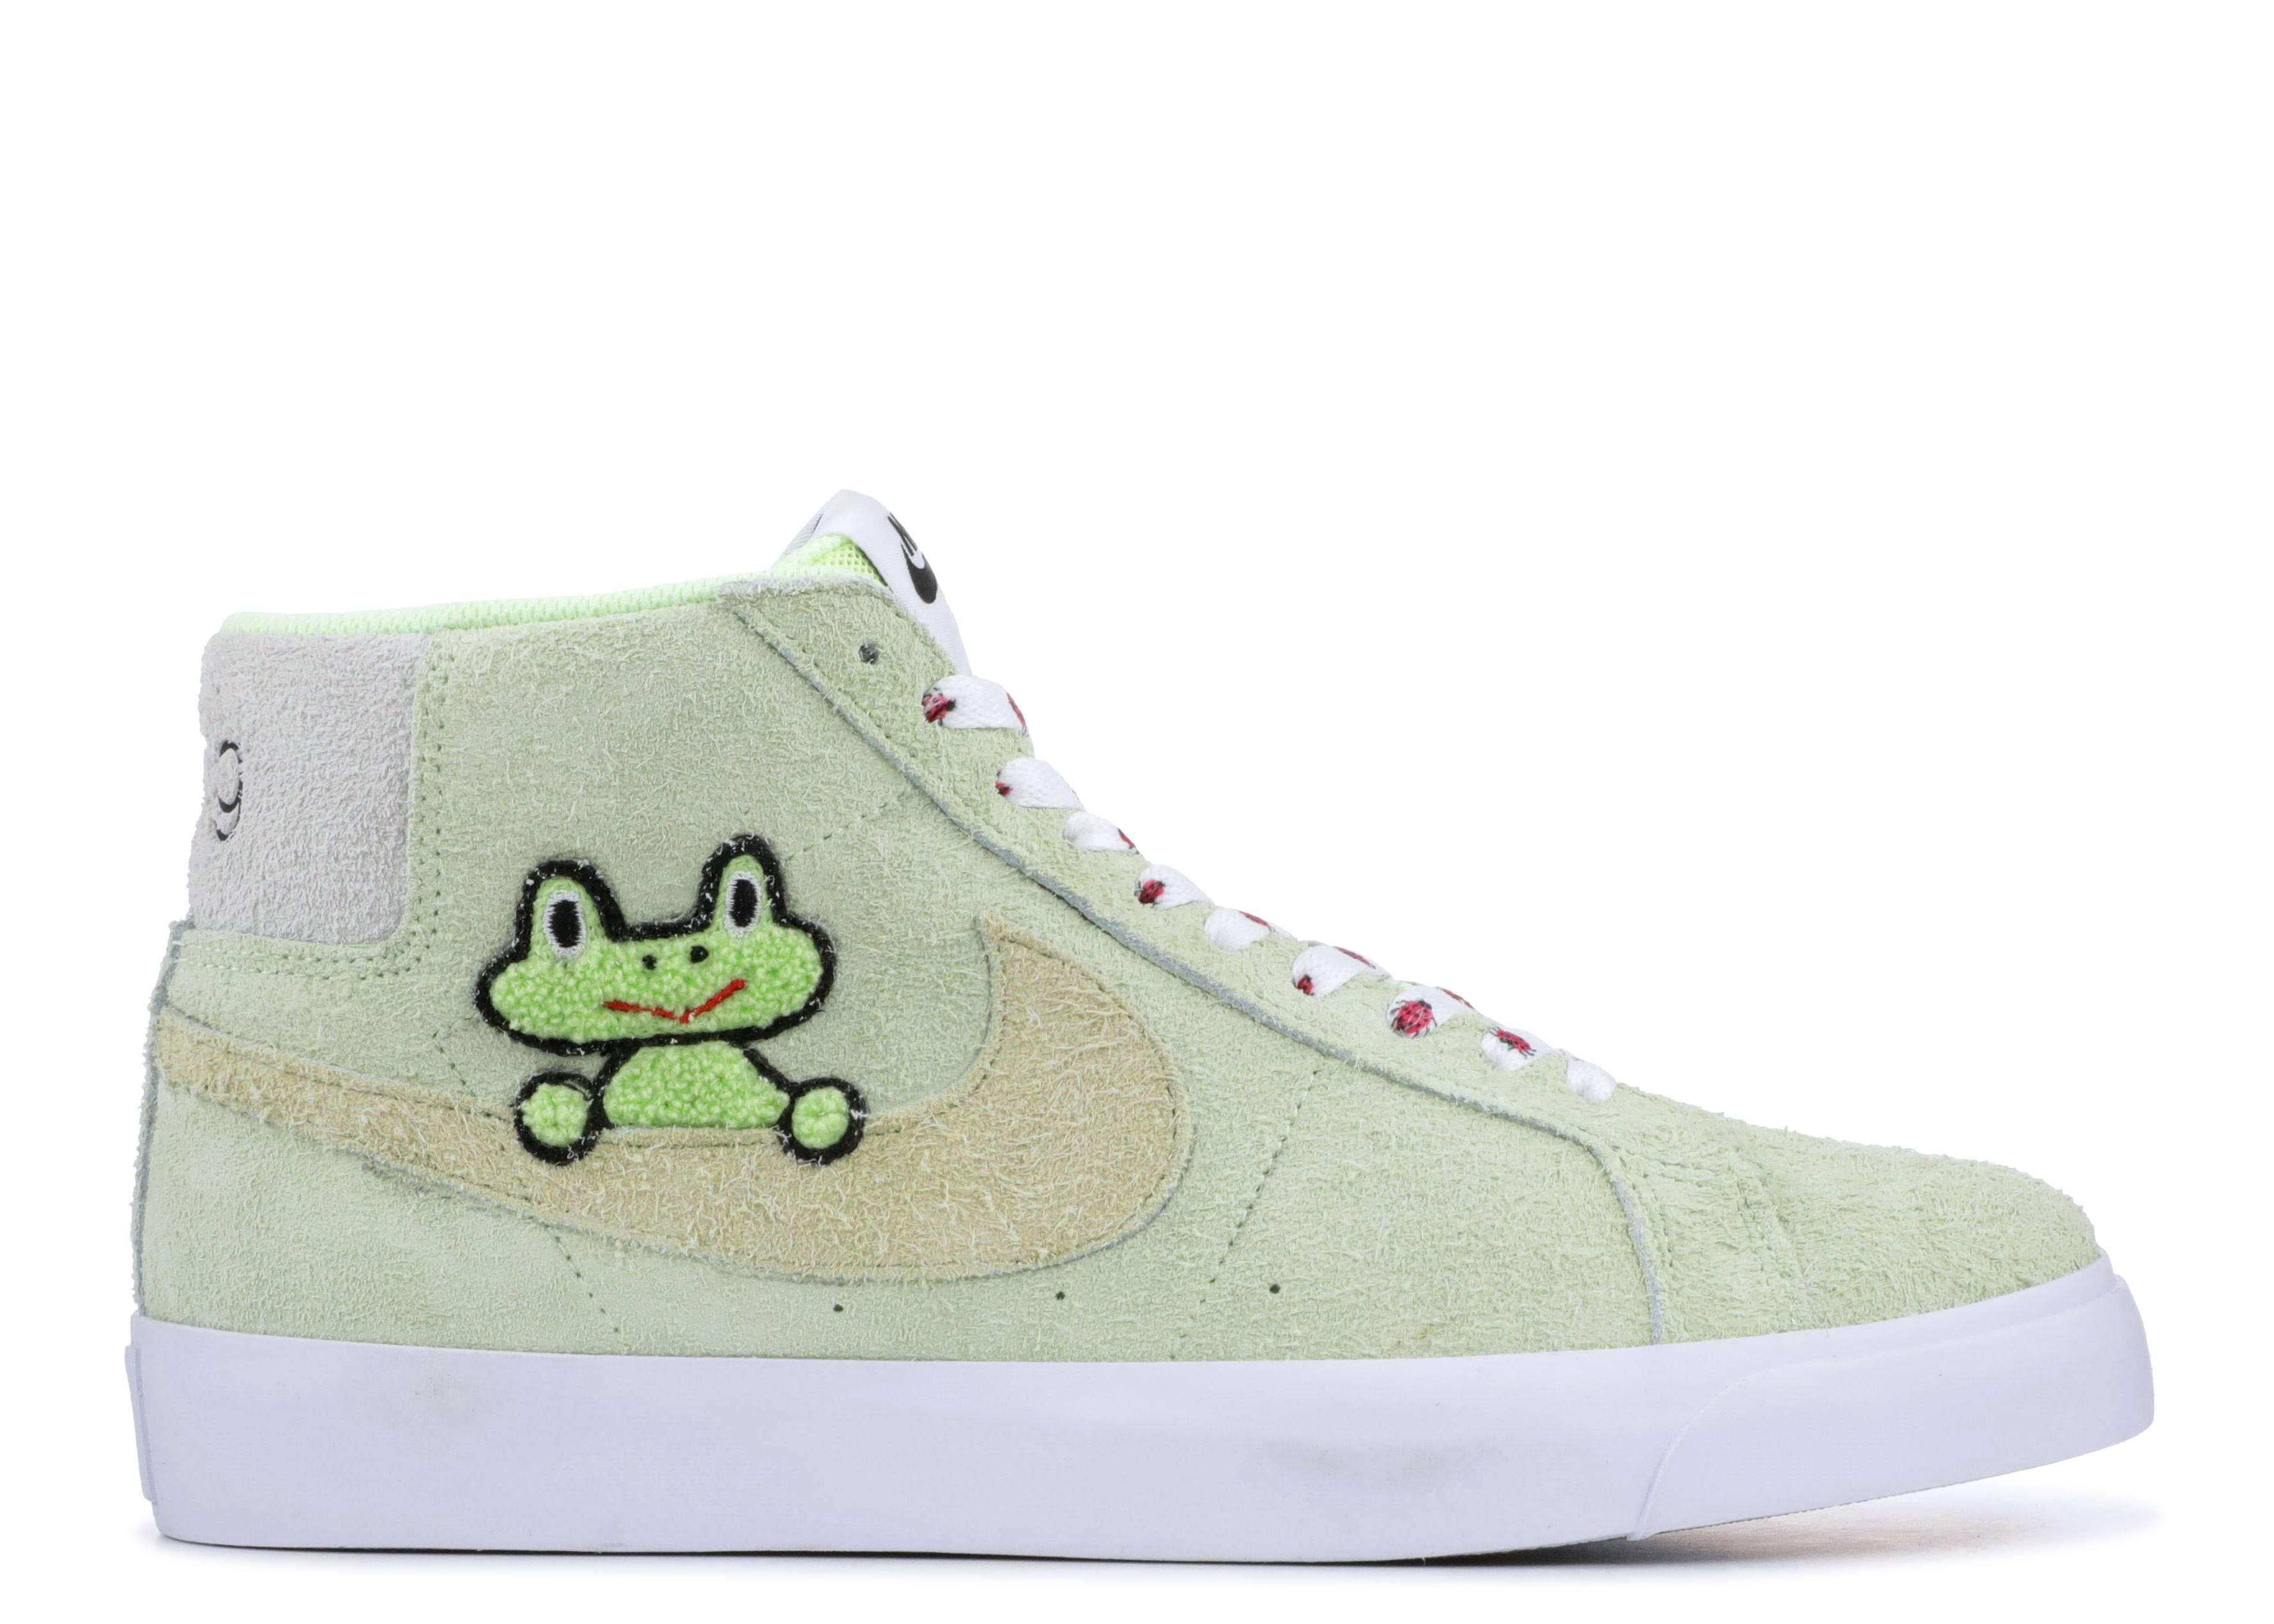 Frog Skateboards x Nike SB Blazer Mid QS Light Liquid LimeWhite For Sale